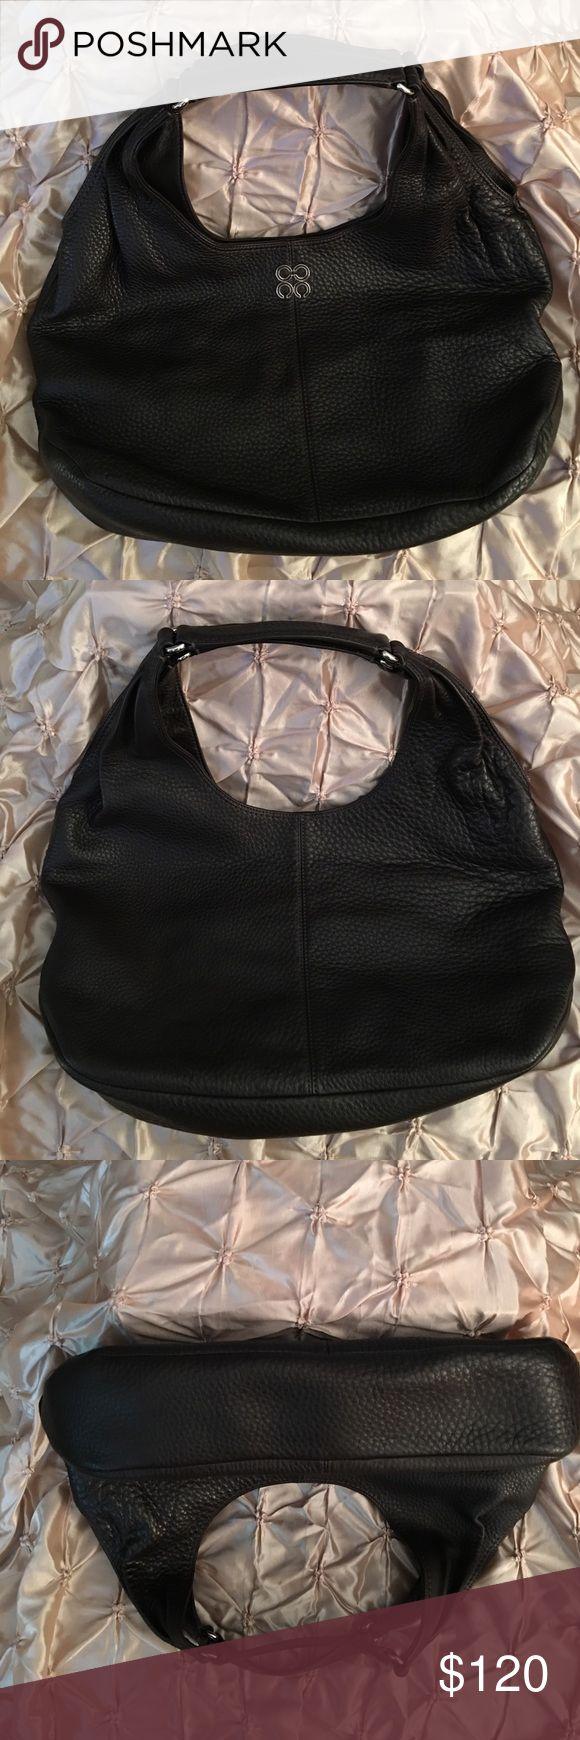 Coach Julia Brown Pebbled Leather Hobo Handbag Coach Julia Brown Pebbled Leather Hobo Handbag Coach Bags Shoulder Bags